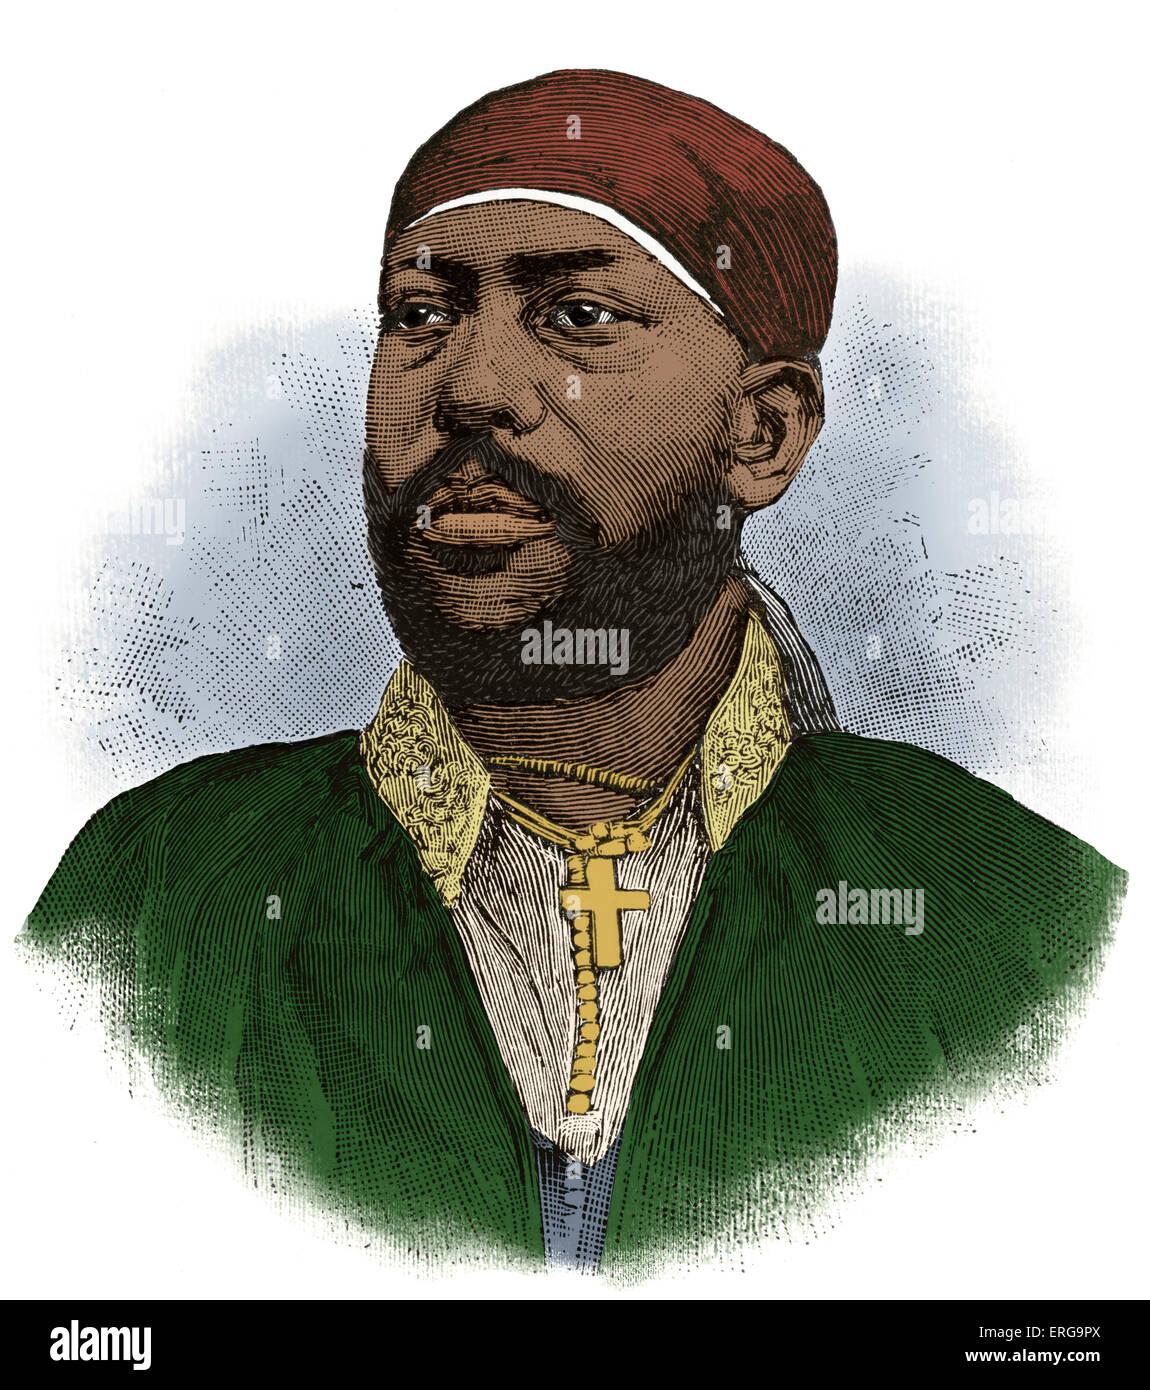 Menelik II, Emperor of Abyssinia, 1889 - 1913. Baptized as Sahle Maryam, b. 17 August 1844 - d. 12 December 1913. - Stock Image